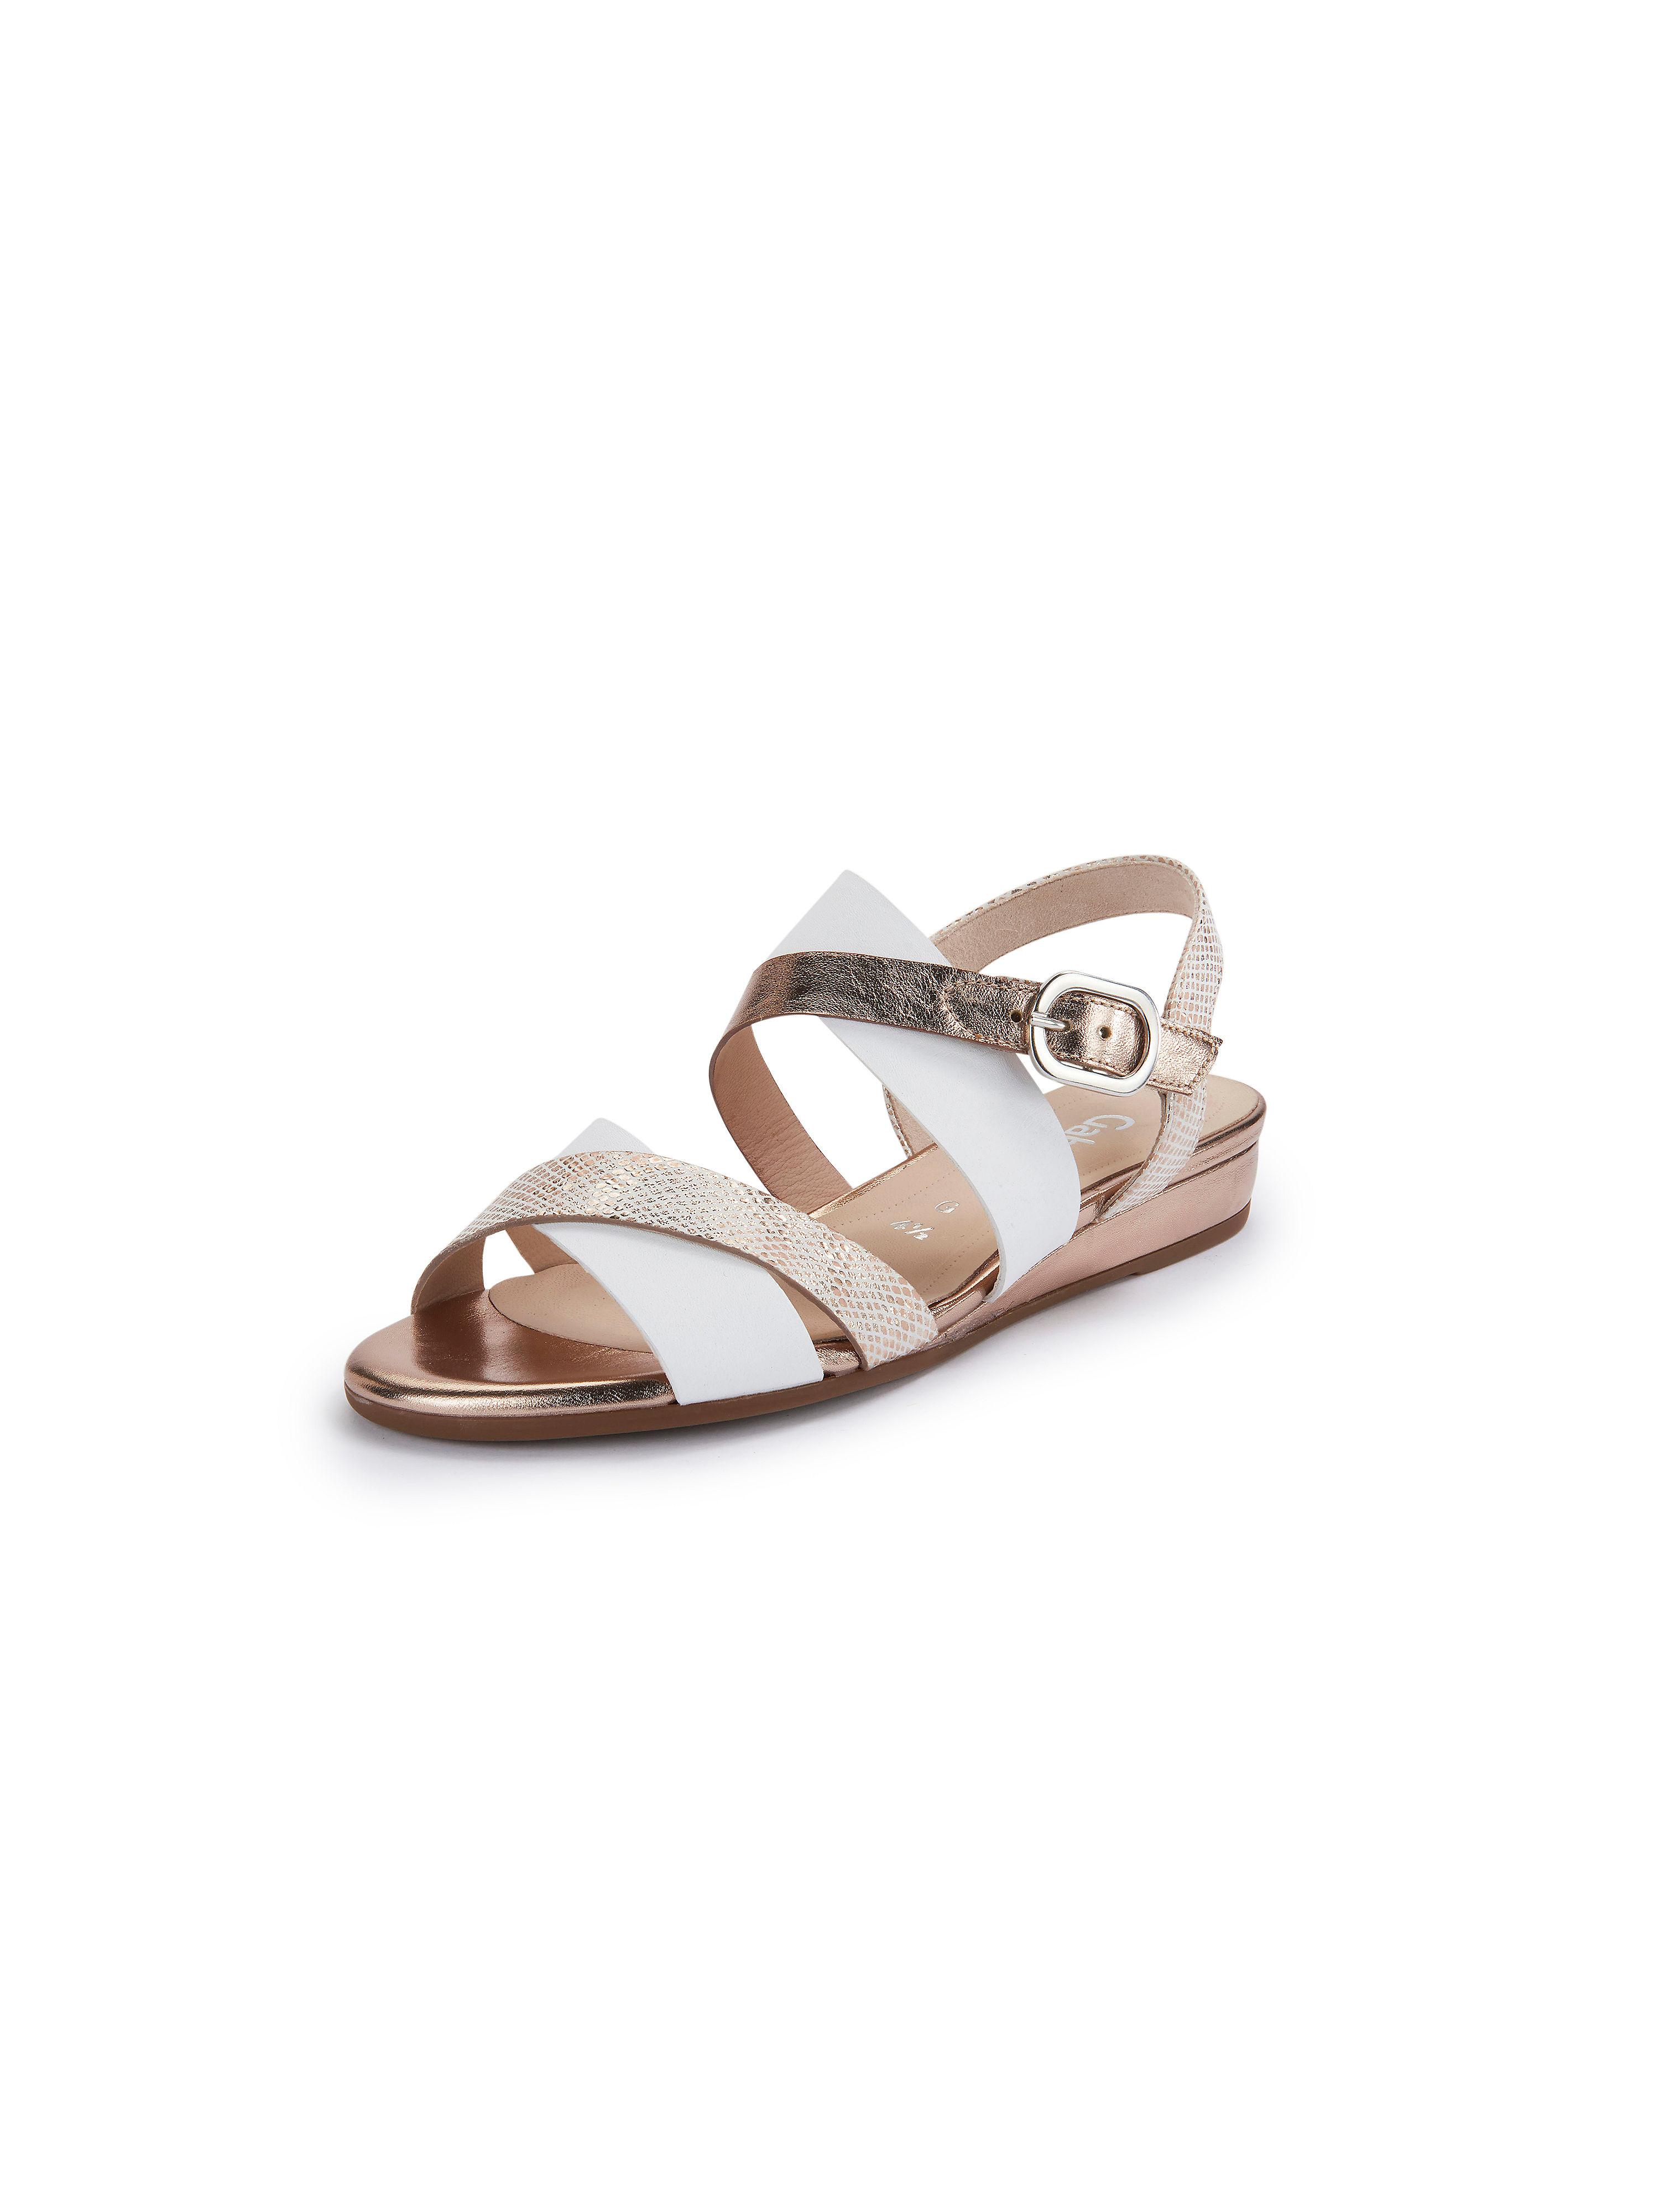 Sandalette Gabor Comfort weiss | Schuhe > Sandalen & Zehentrenner | Metallic - Weiß | Gabor Comfort